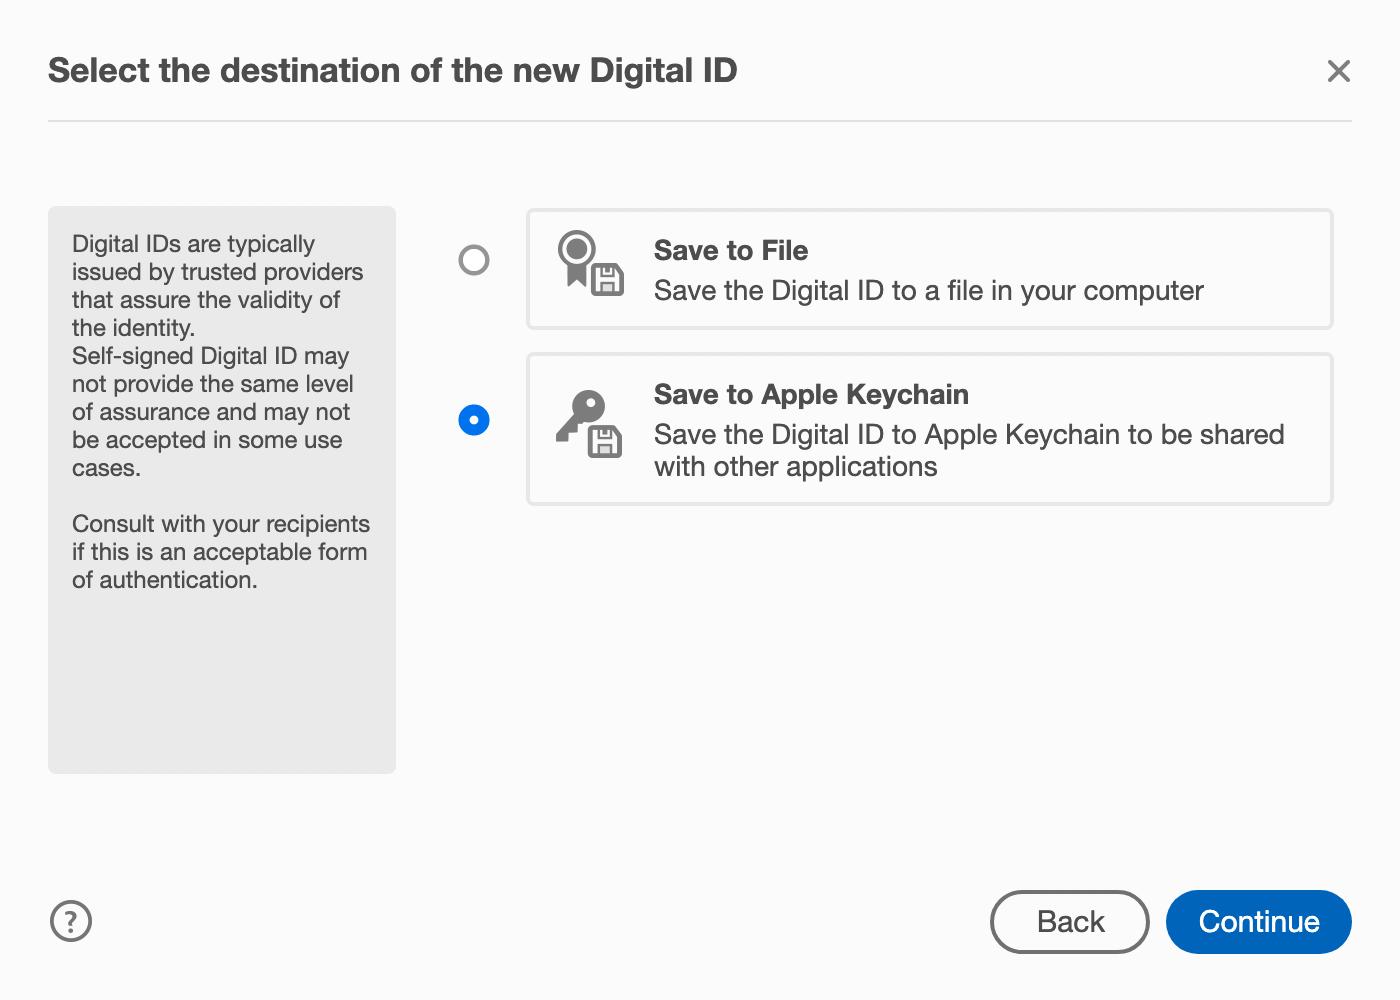 Digital ID destination